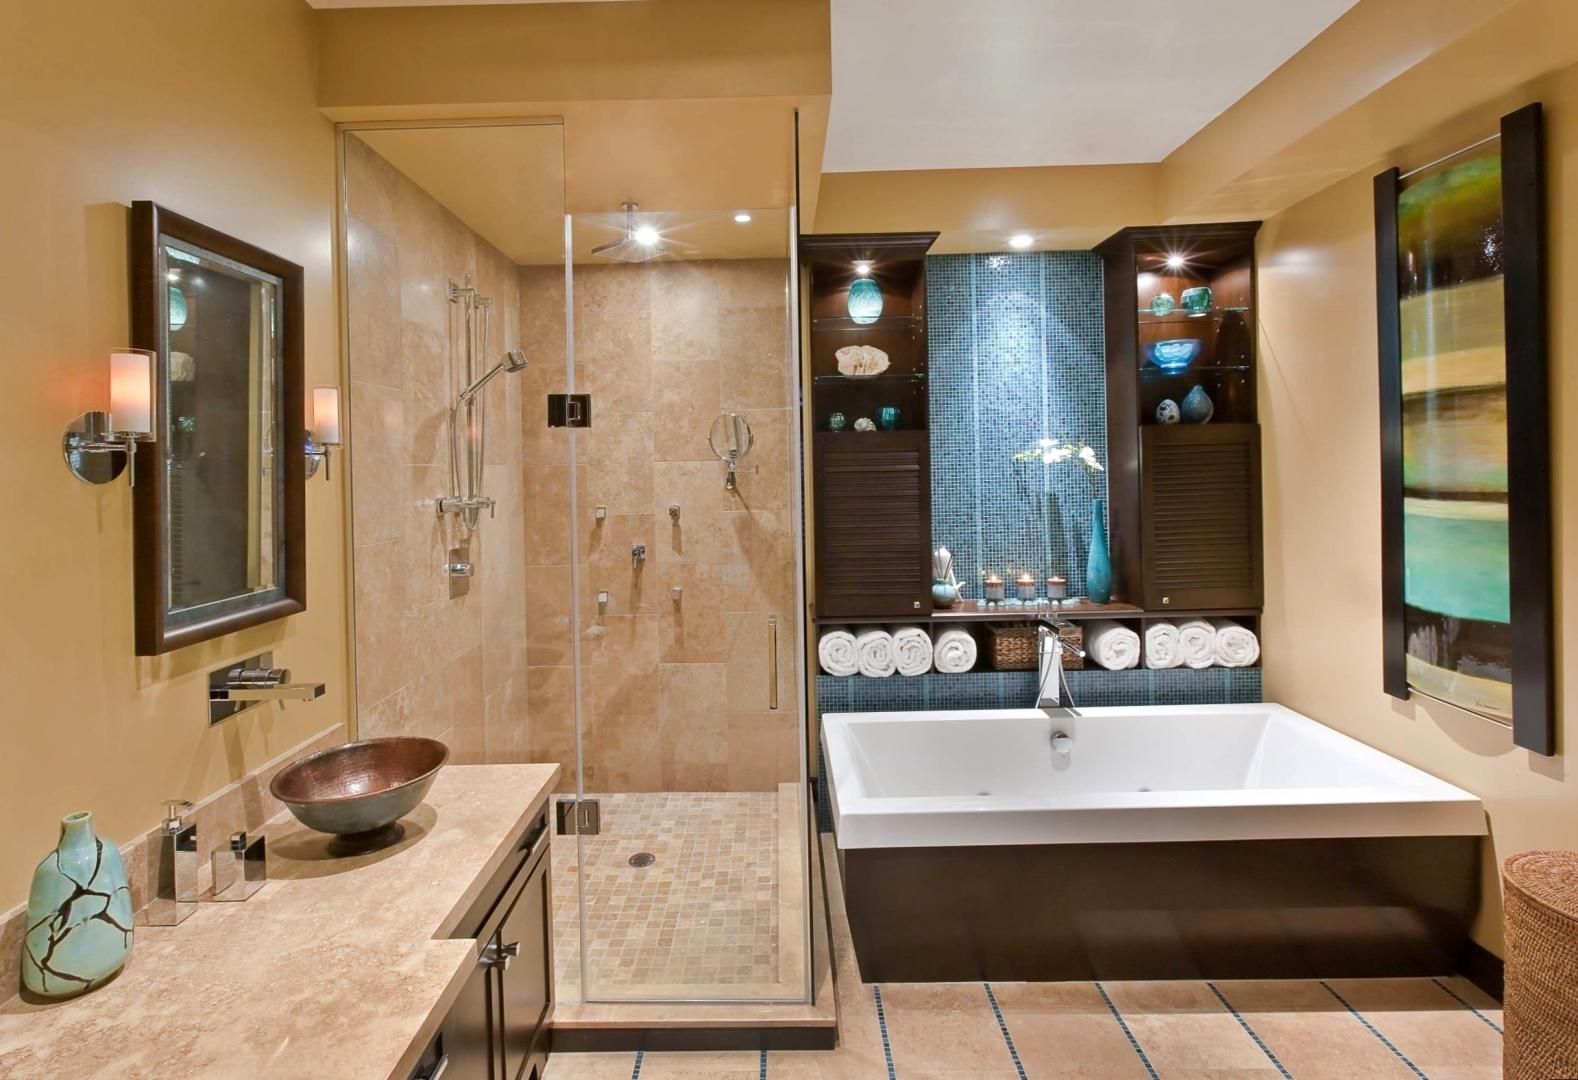 Дизайн ванной комнаты 9 кв. м.